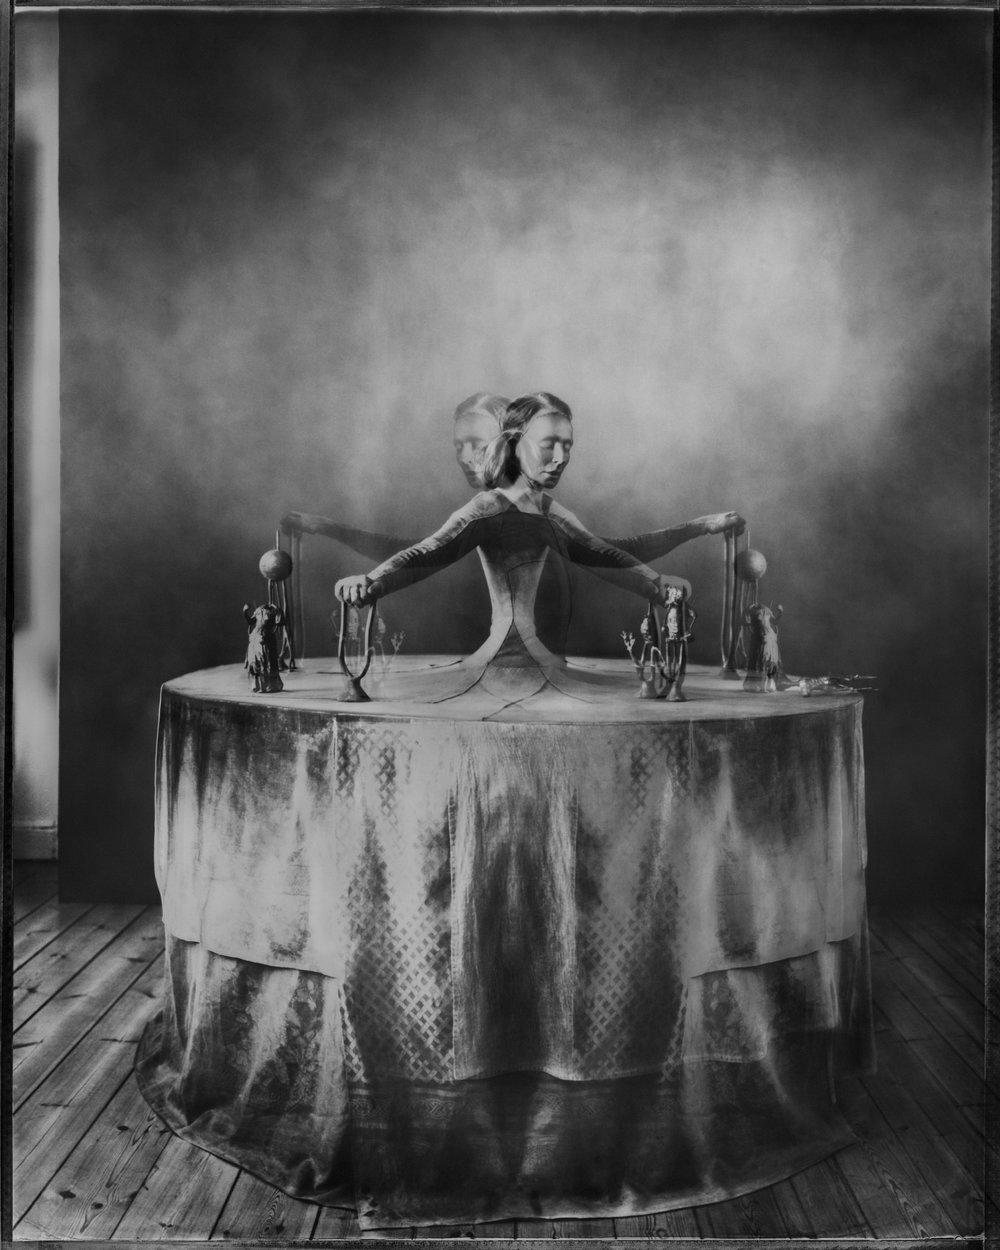 Denise Grünstein   Bodydouble, 2018  Silvergelatin Print  56 x 45 cm Edition 6 + 2 AP  100 x 80 cm Edition 3 + 2 AP